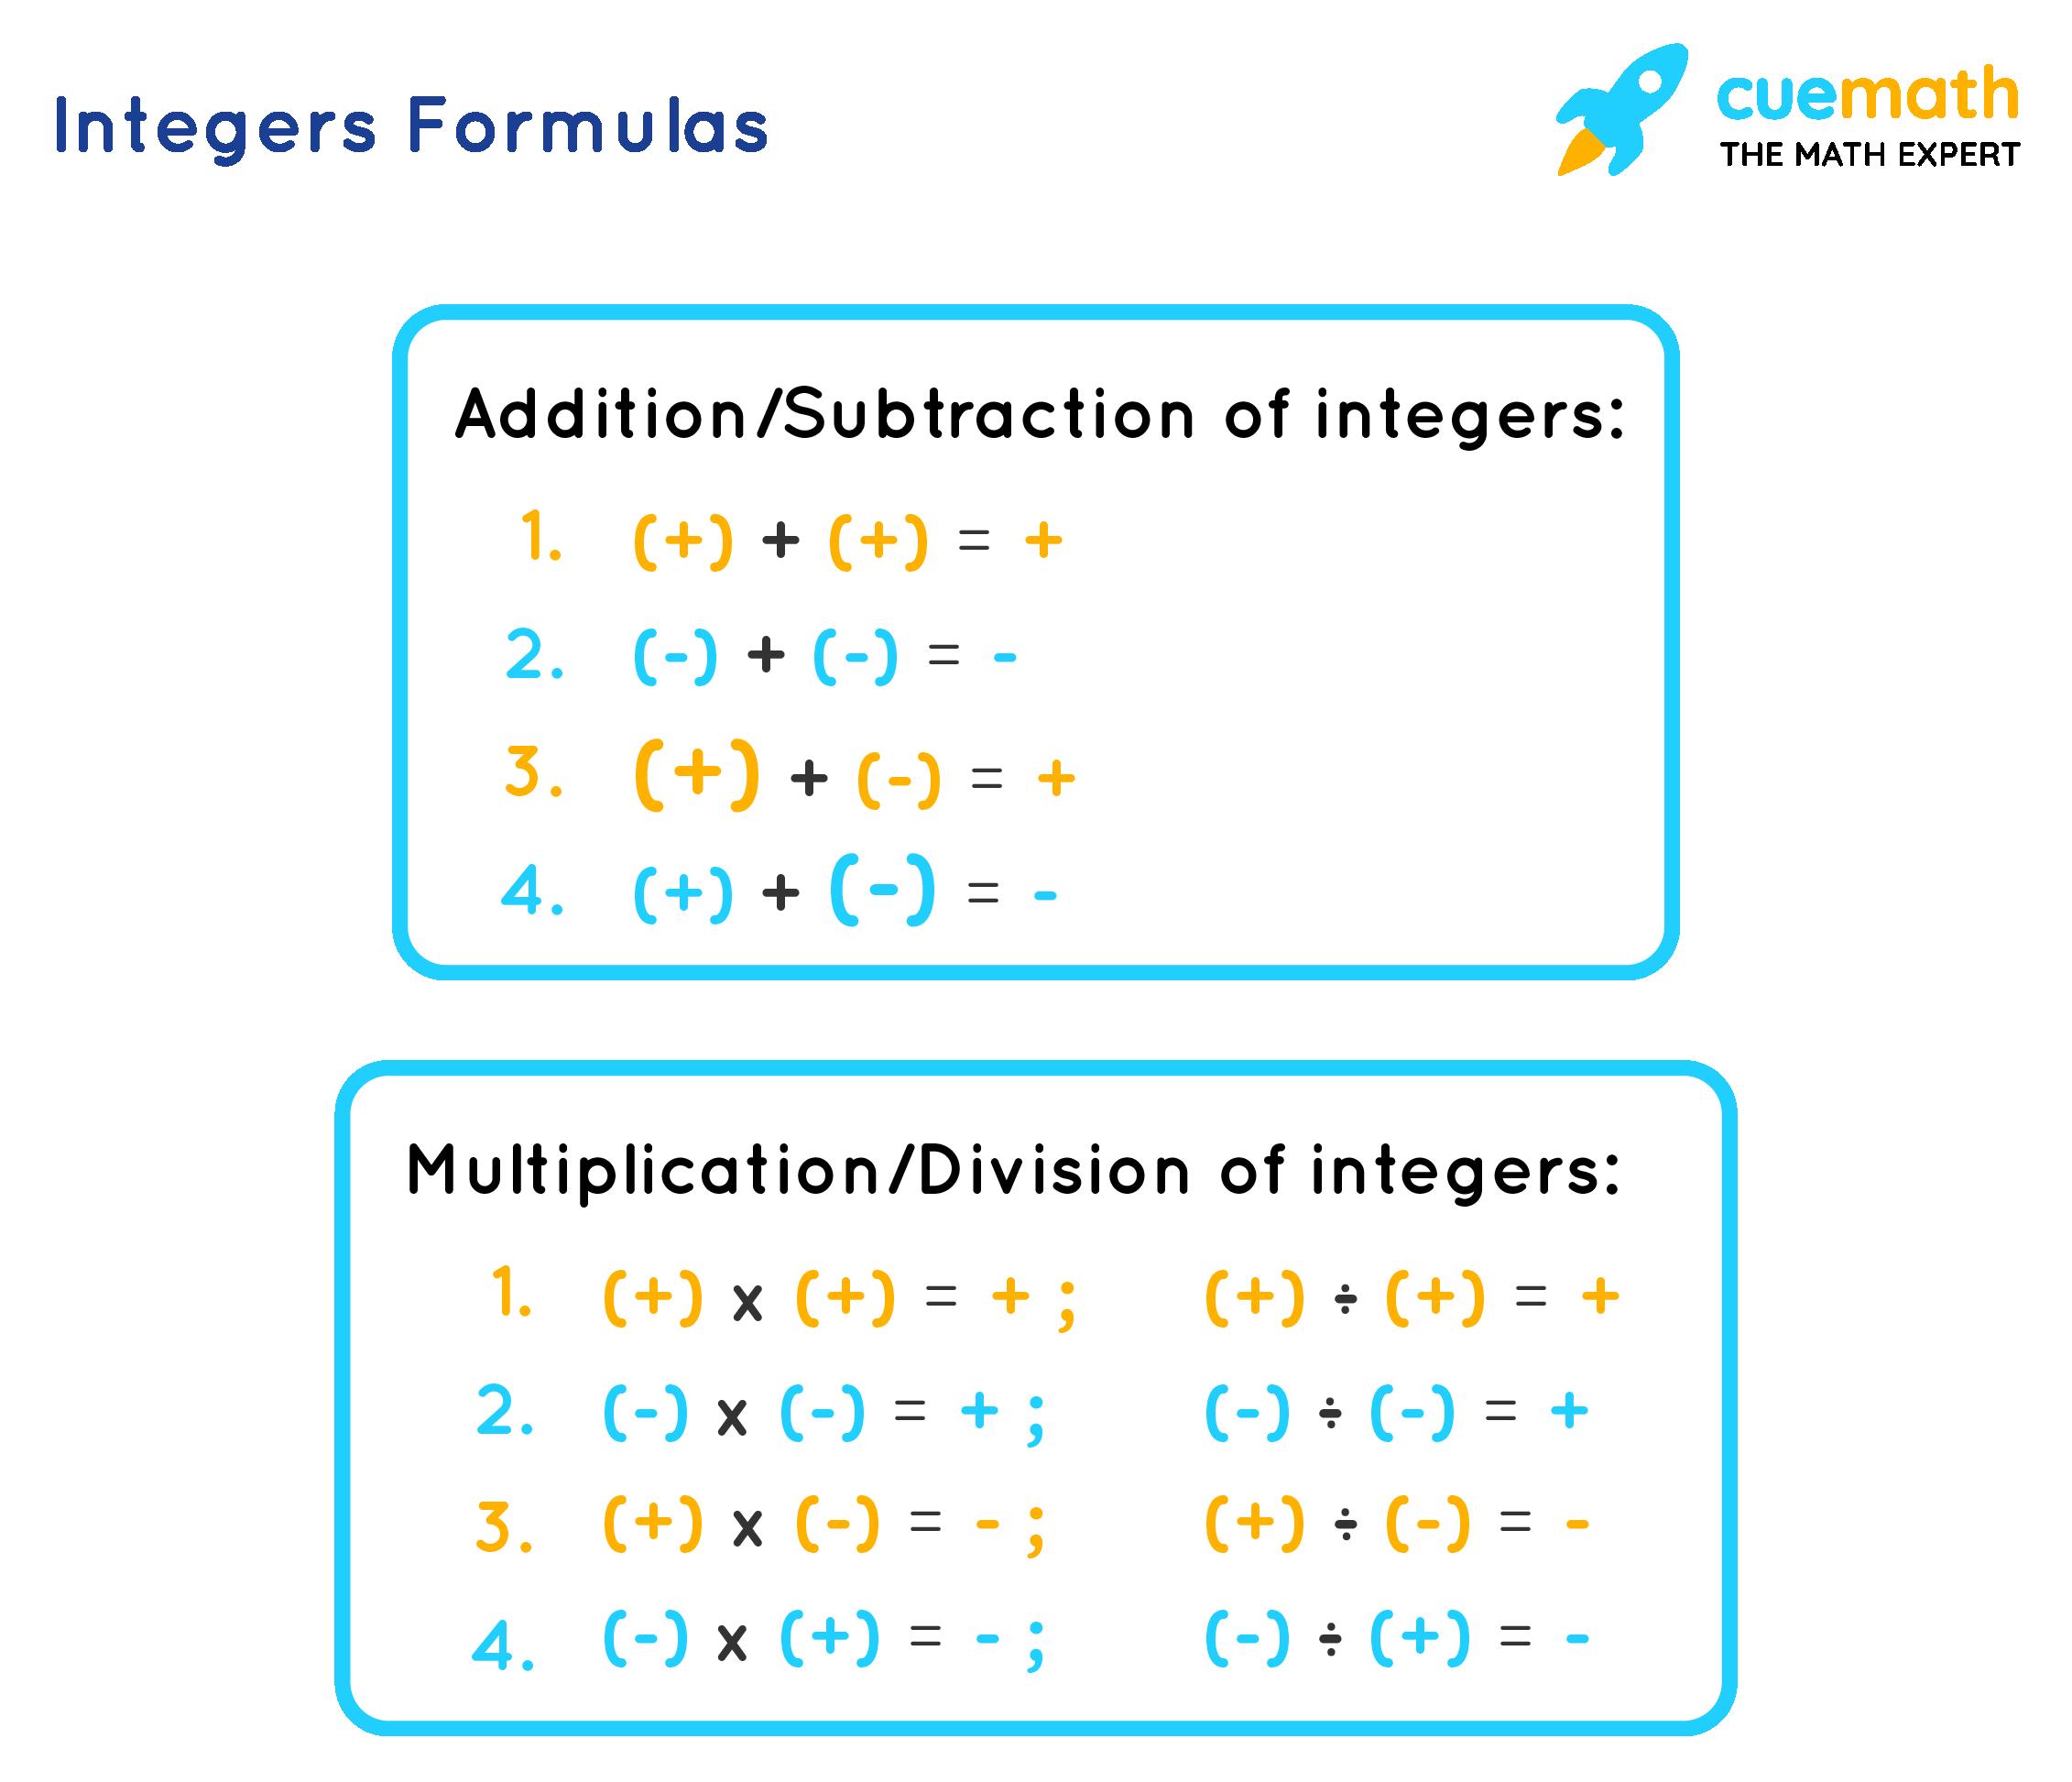 Integers formulas